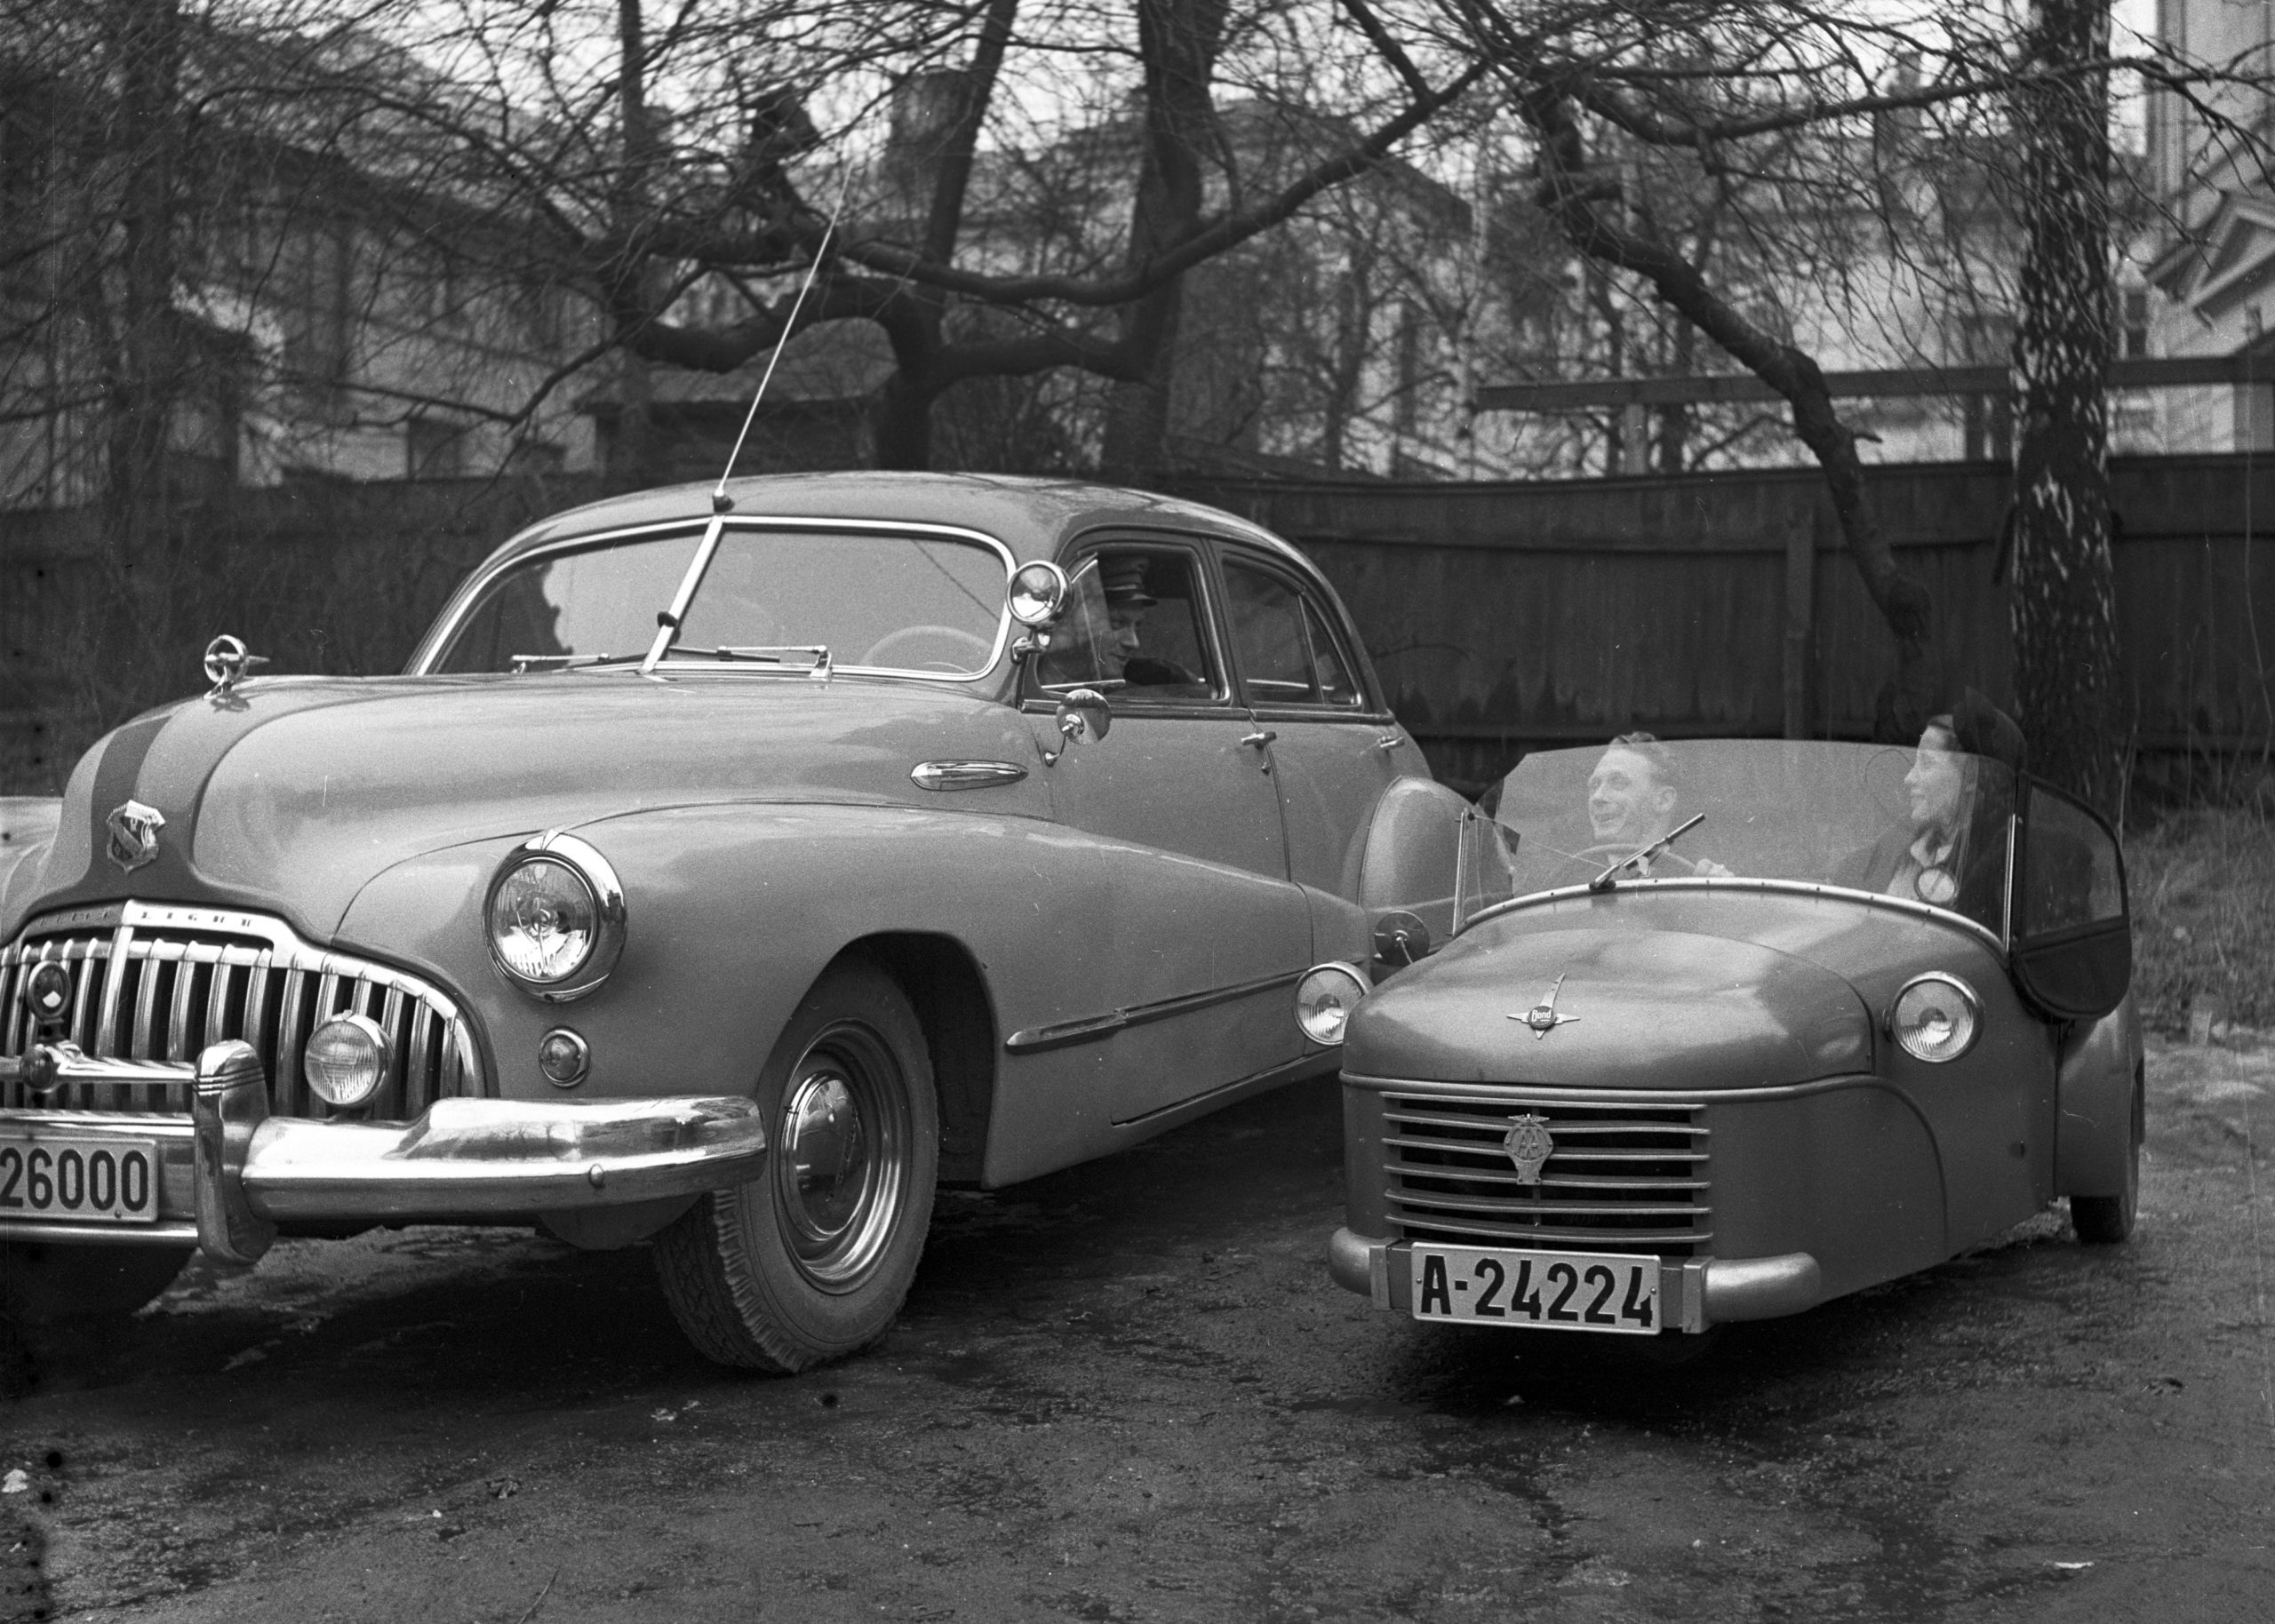 Engelske biler, Frognerseteren 1956